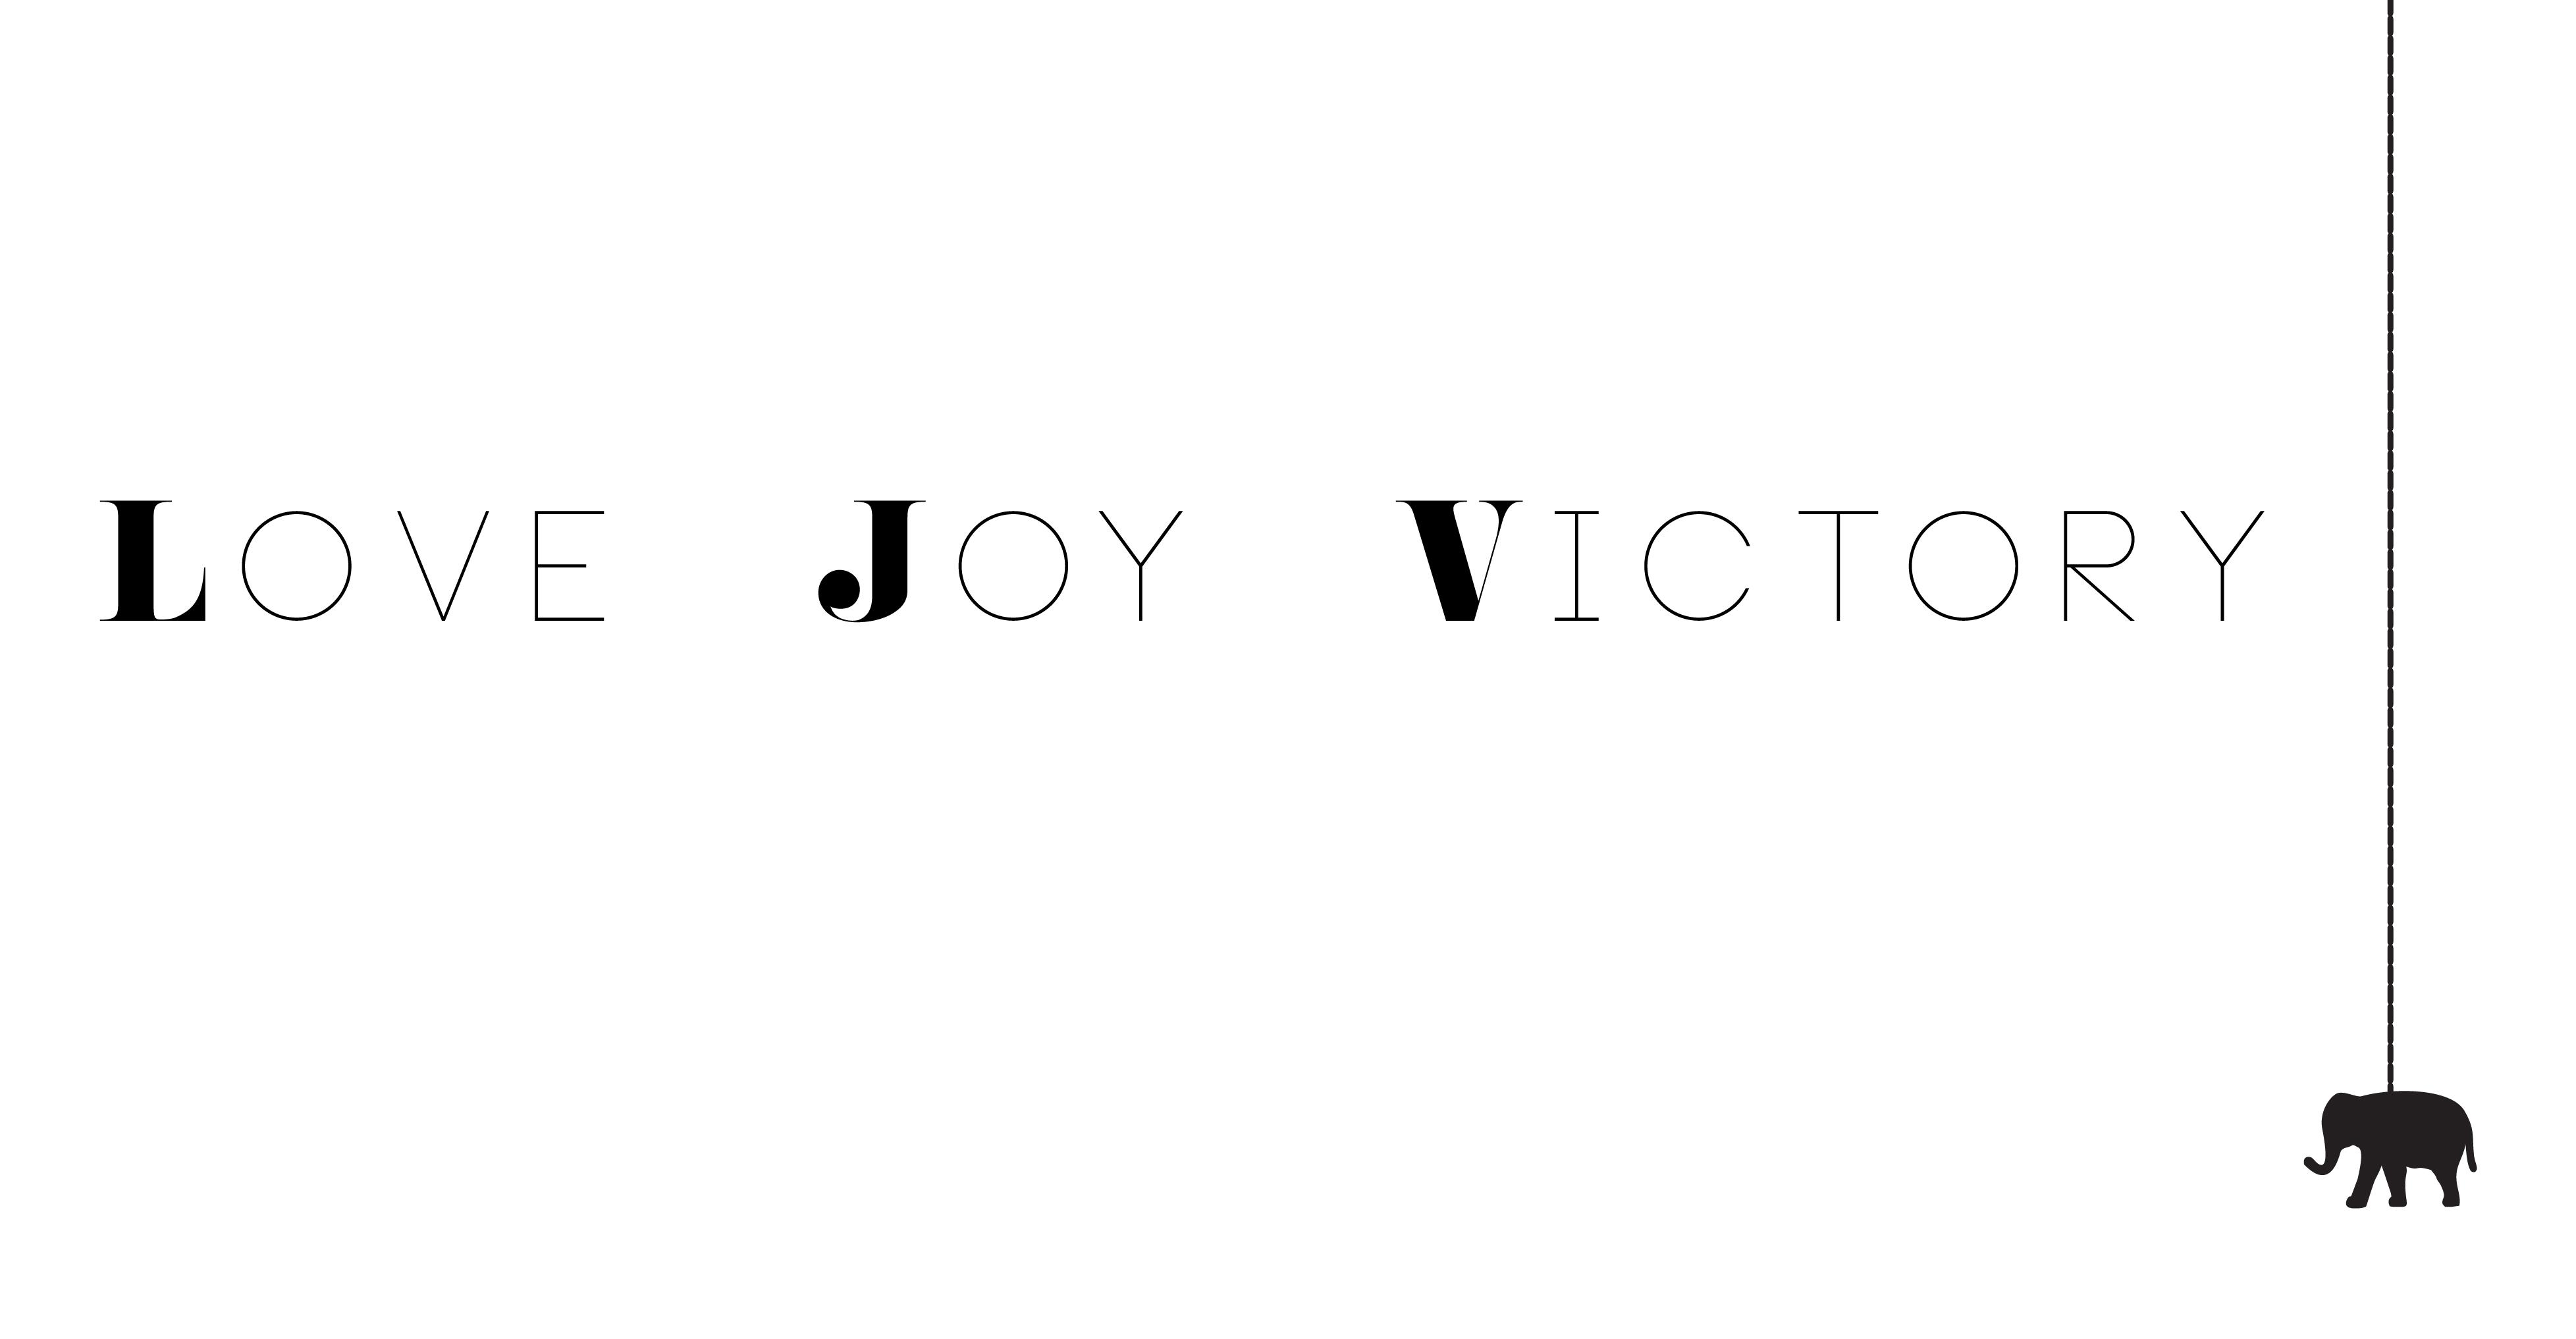 LOVE JOY VICTORY